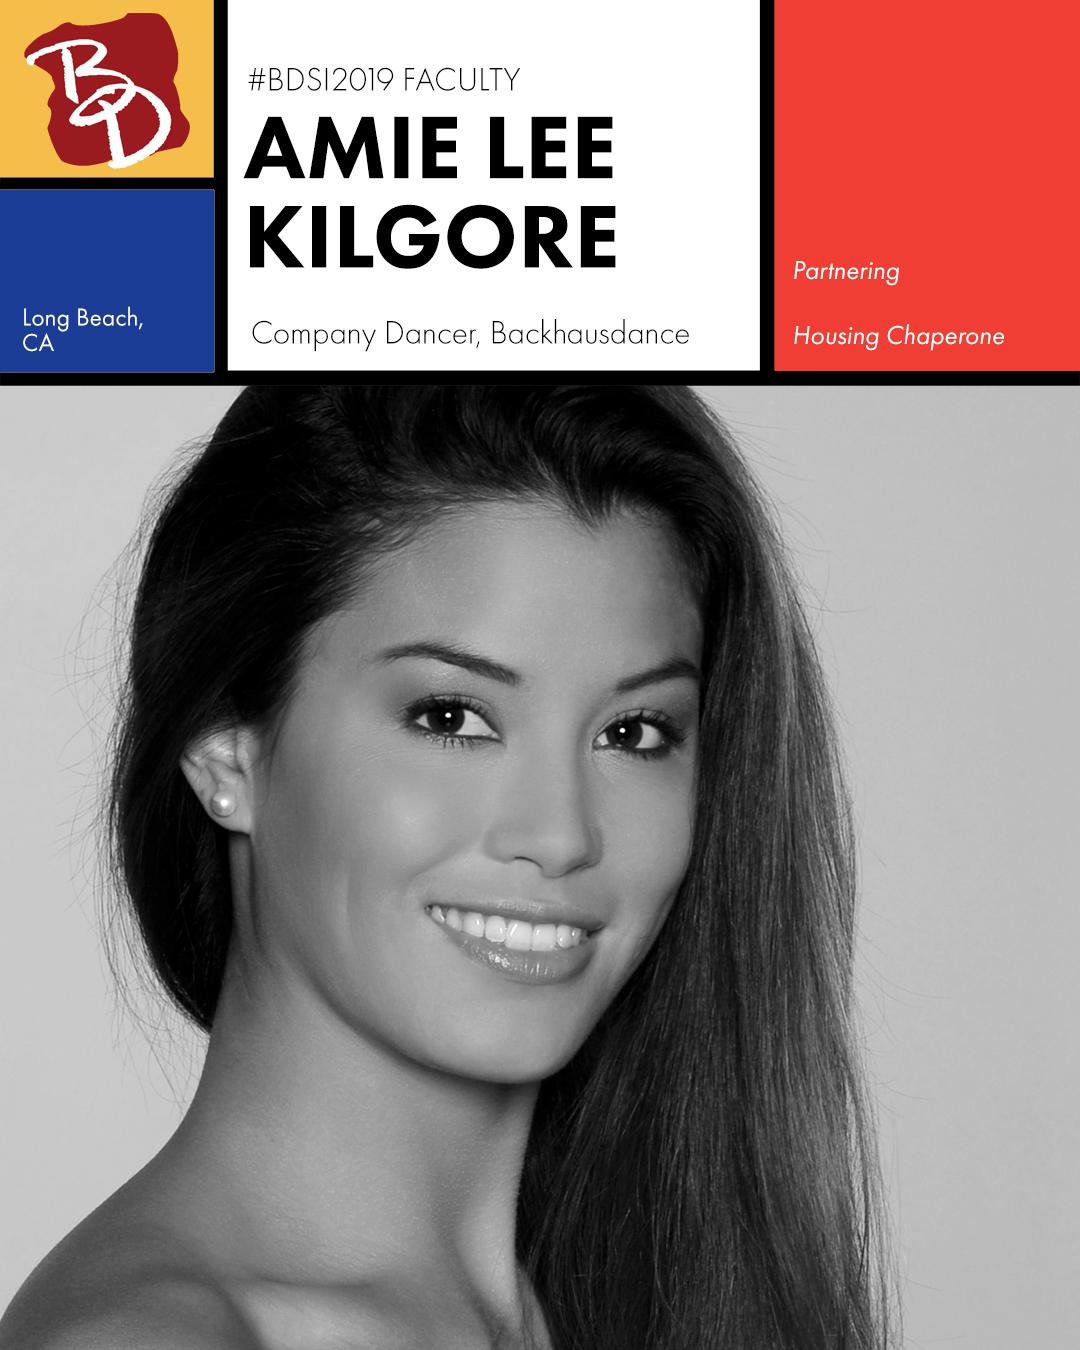 Faculty Announcement - Kilgore Amie Lee.jpg